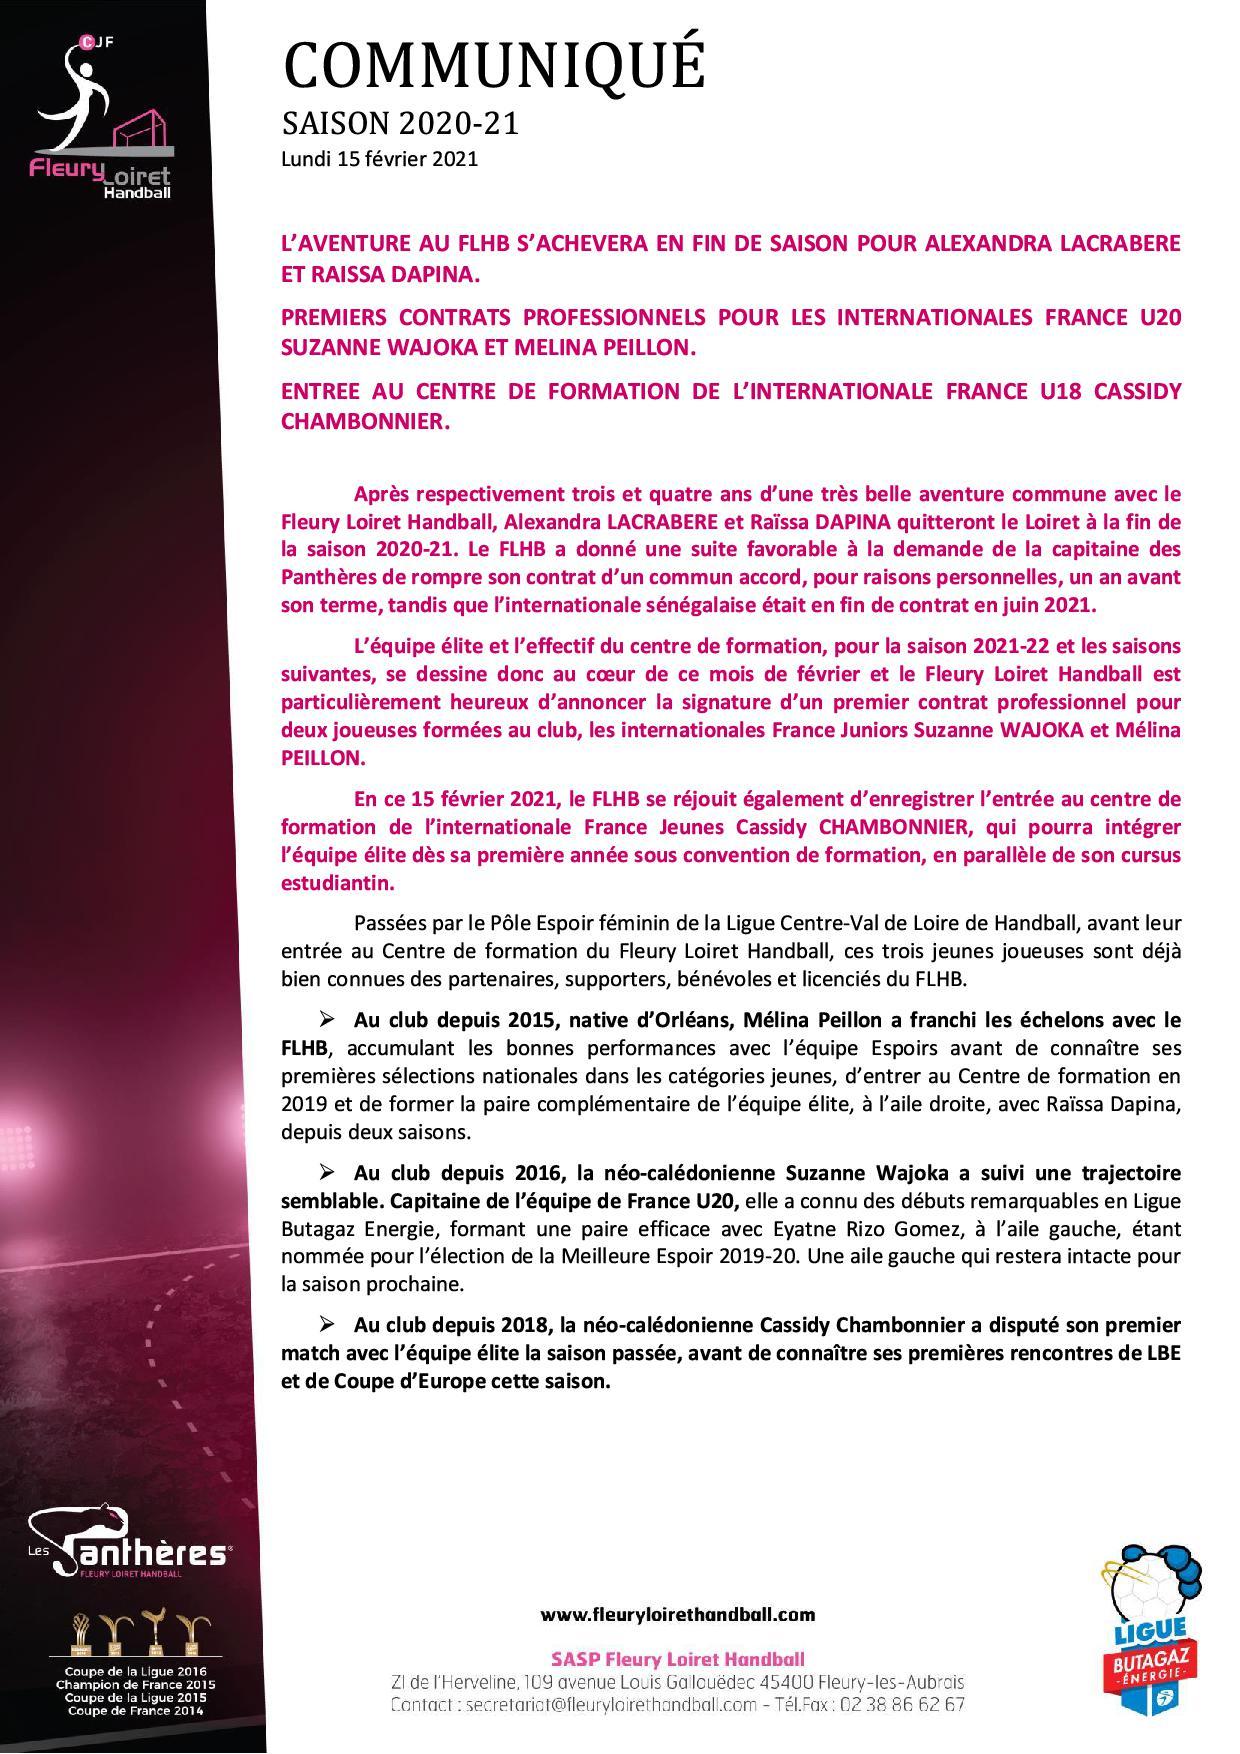 Communiqué Fleury Loiret Handball - Lundi 15 février 20211.jpg